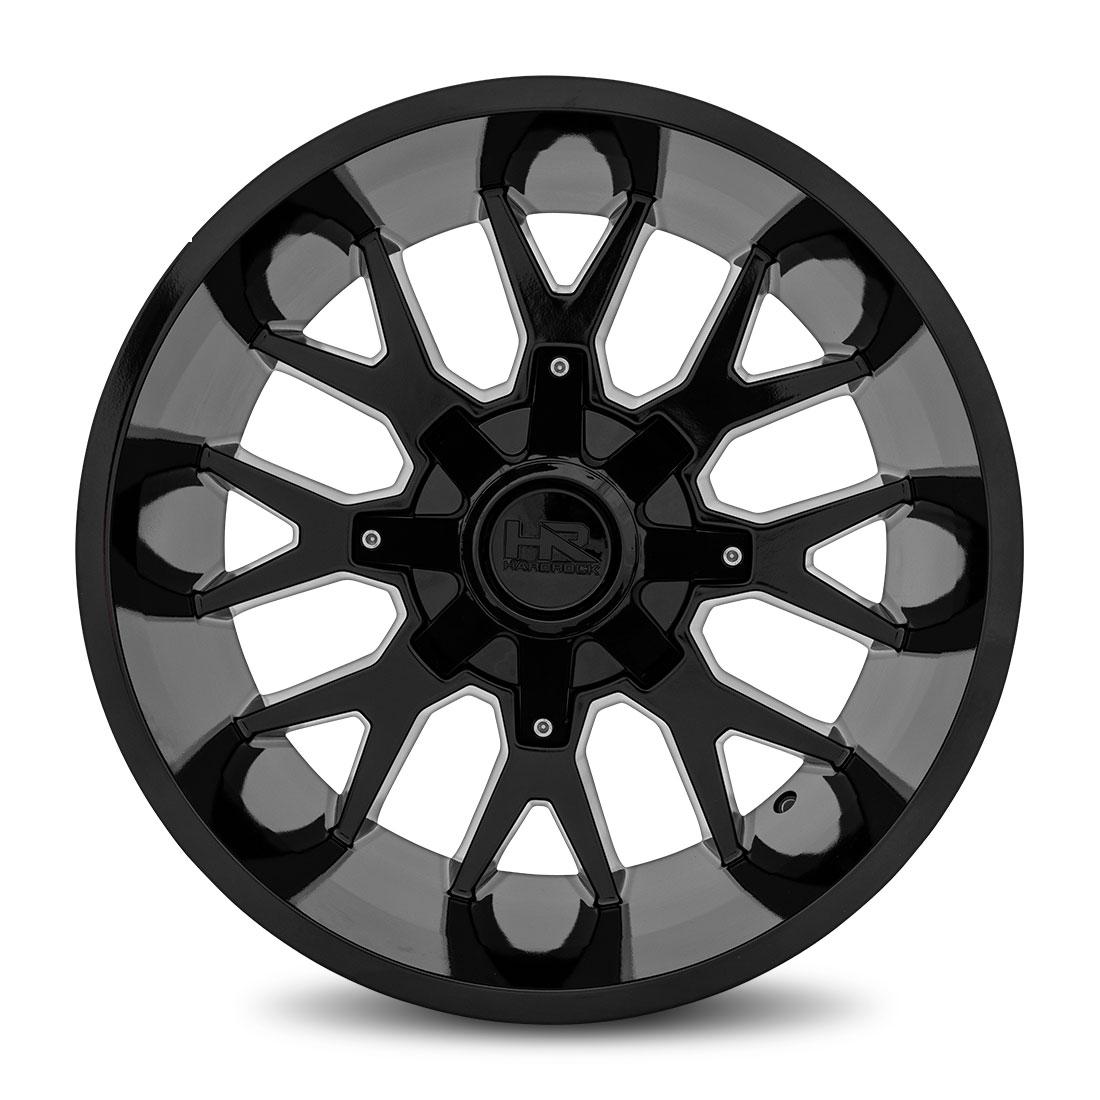 Hardrock Offroad Wheels H700 Affliction - Gloss Black - 20x12